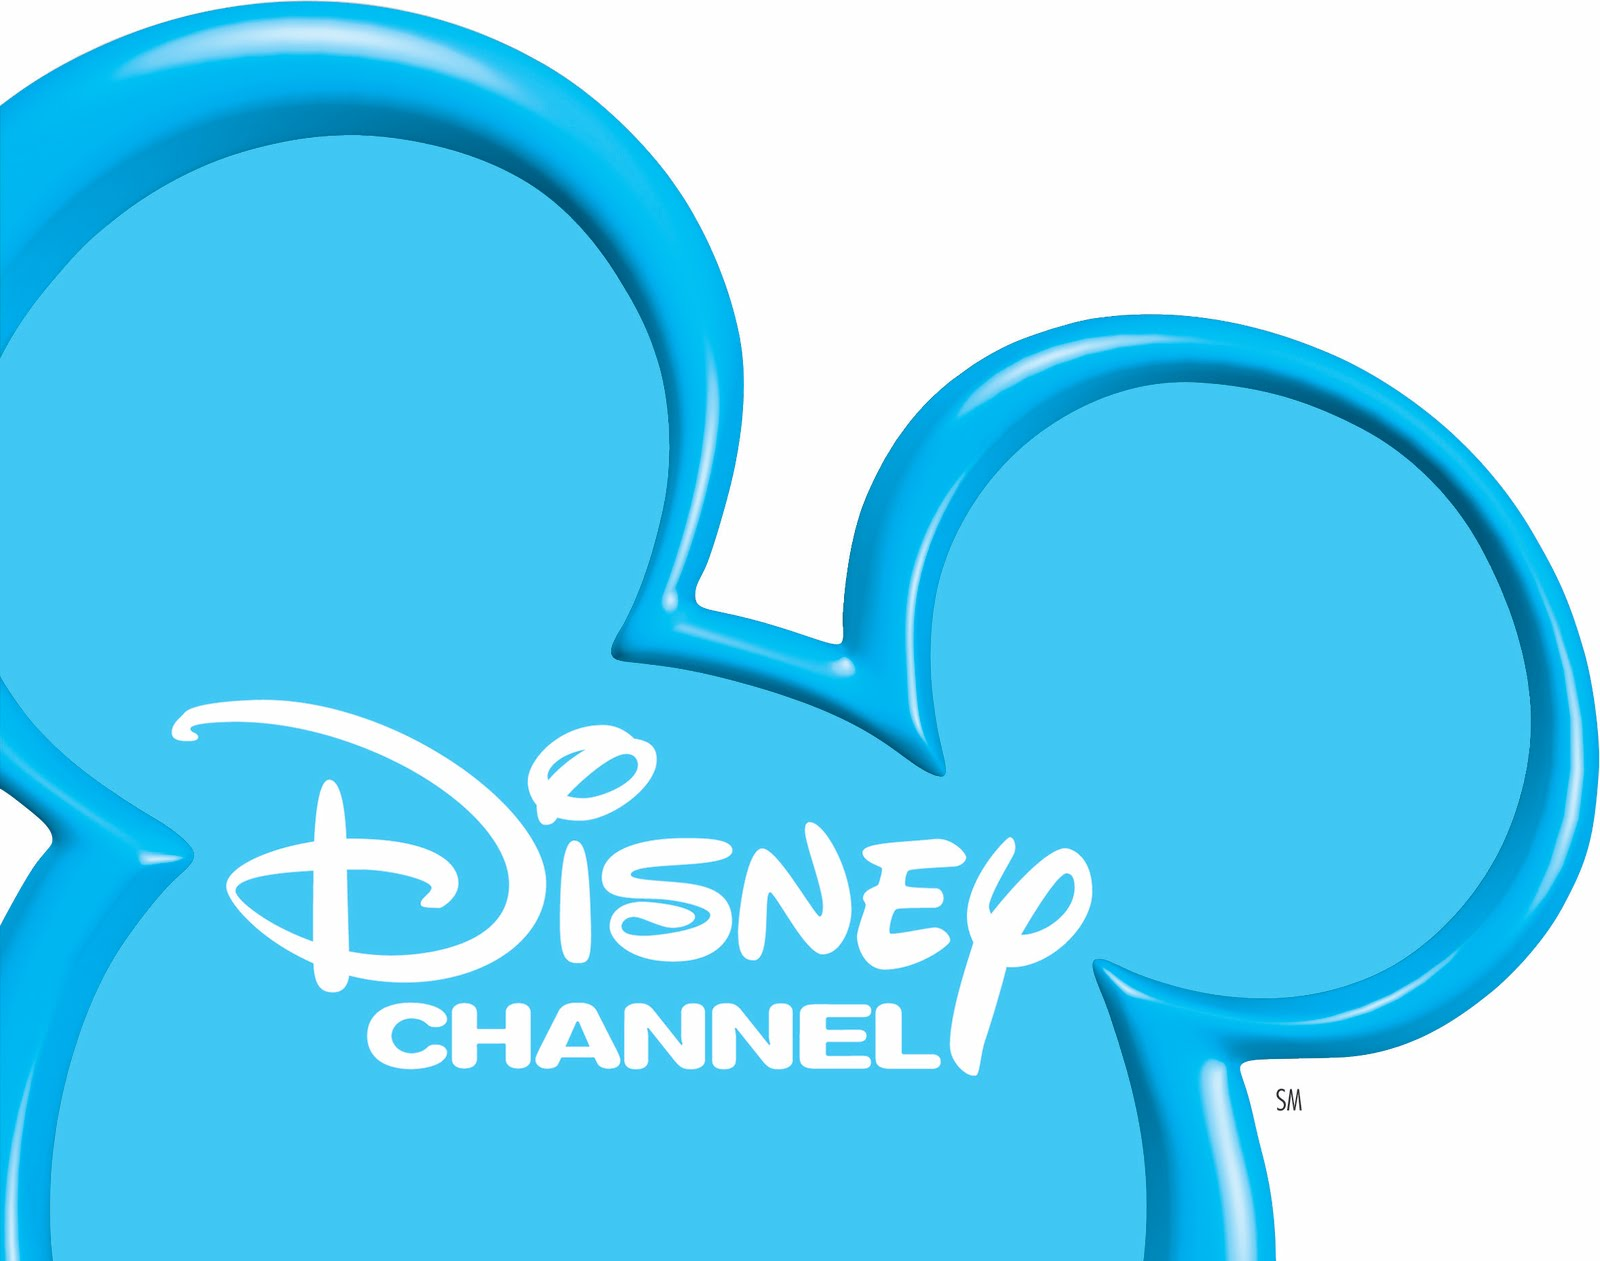 disney channel logo computer wallpaper 62896